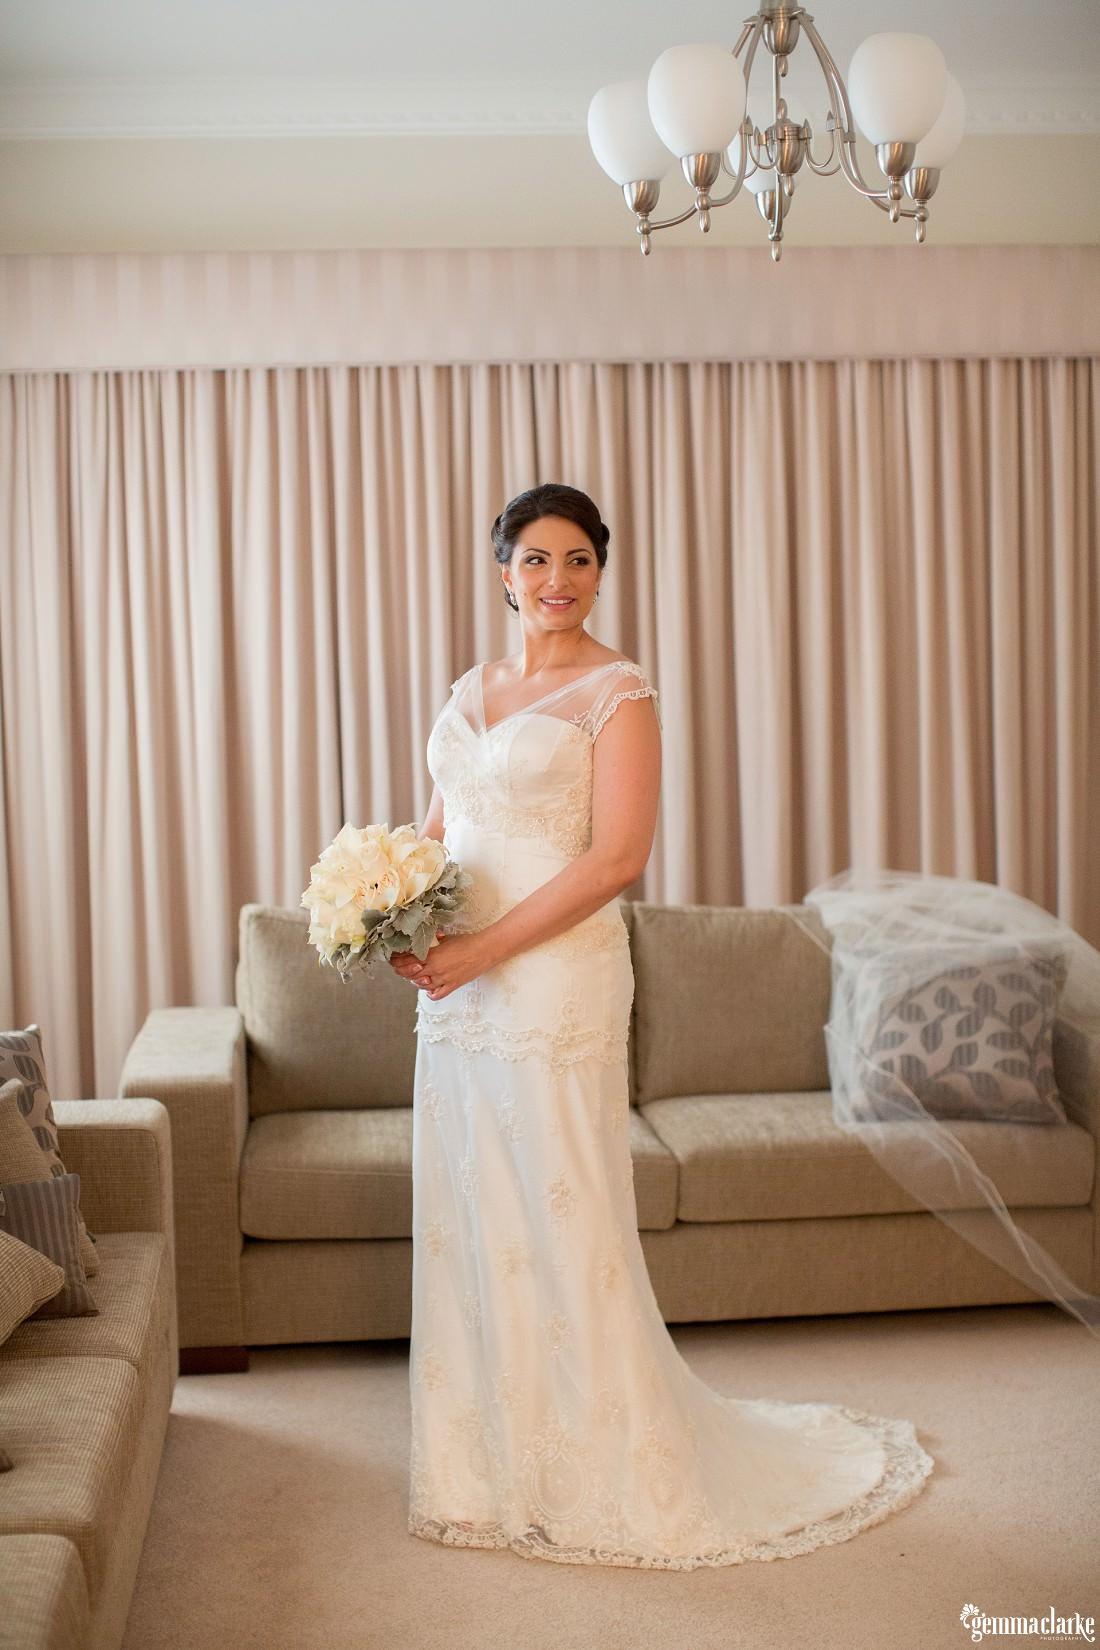 gemma-clarke-photography_botanic-gardens-wedding-reception_amanda-and-dylan_0008